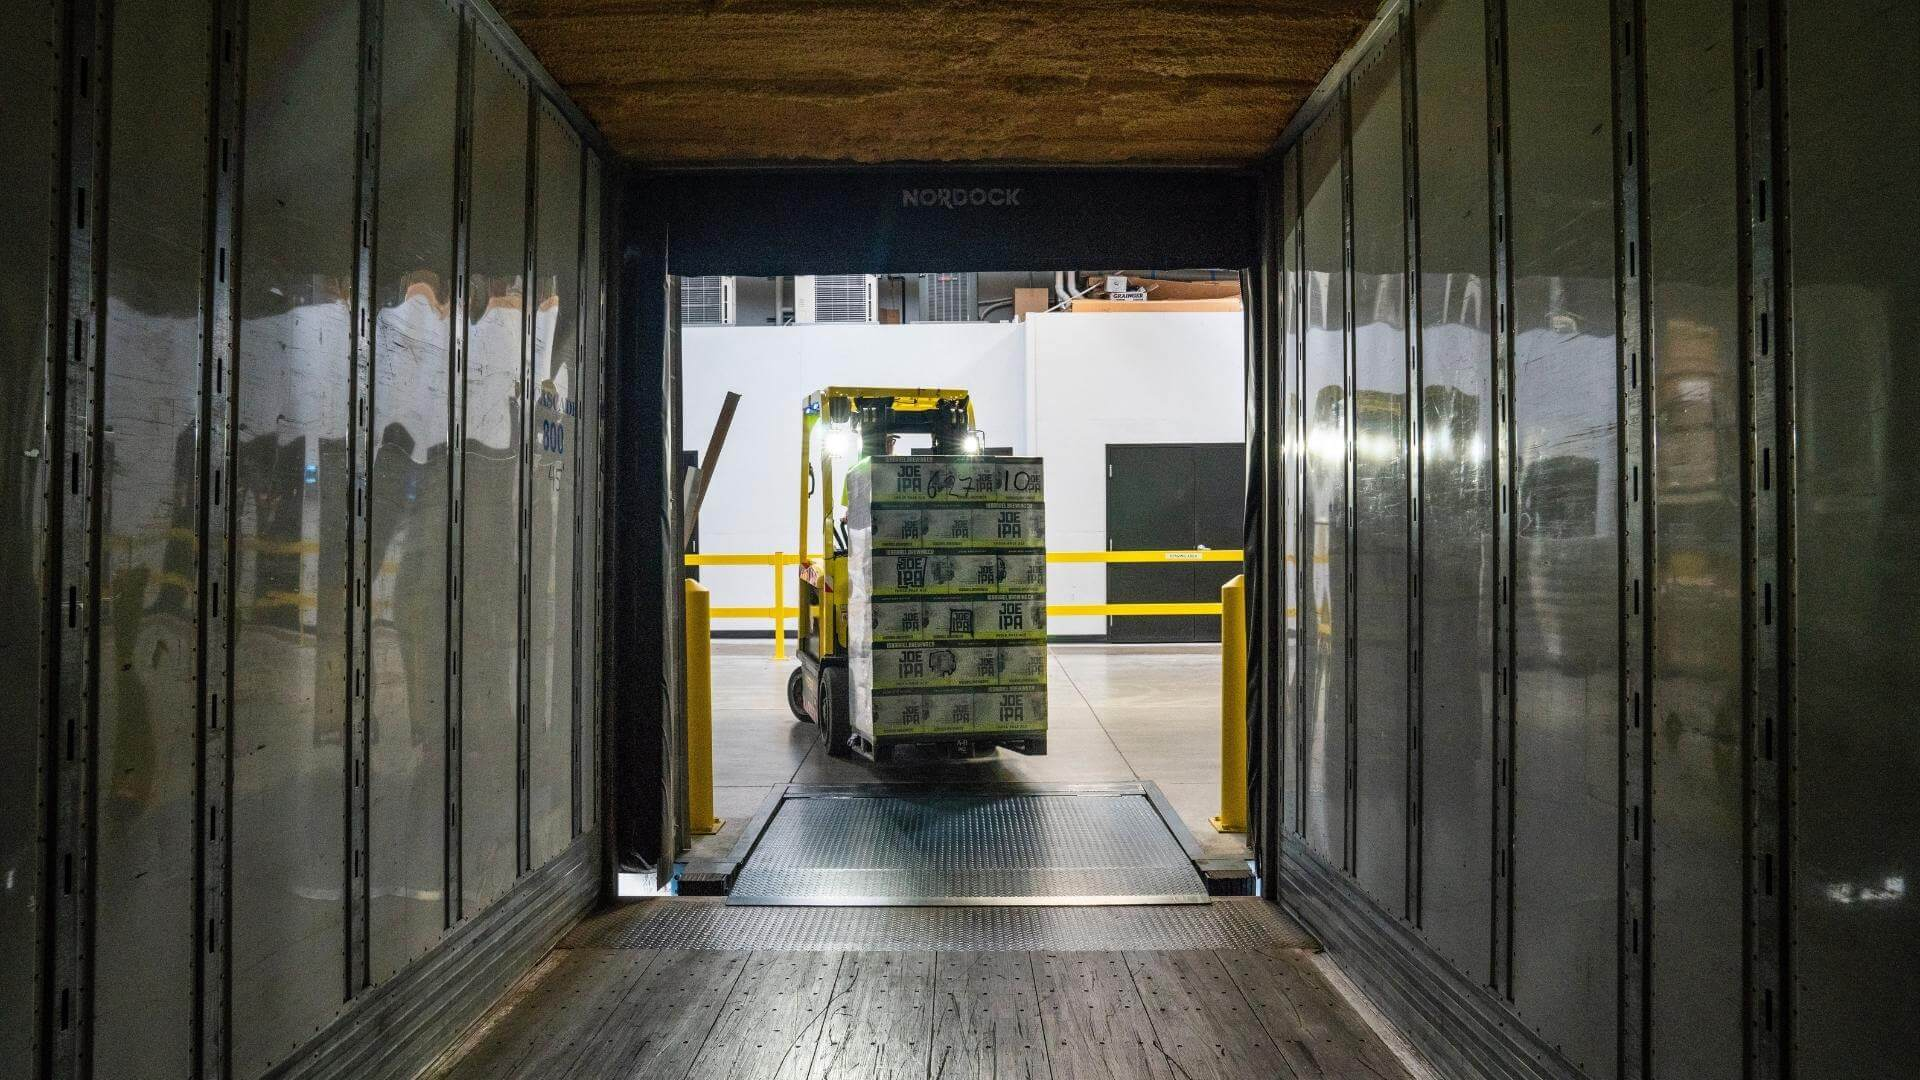 Shipment Logistics and E-Invoicing Compliance in LatAm (1)